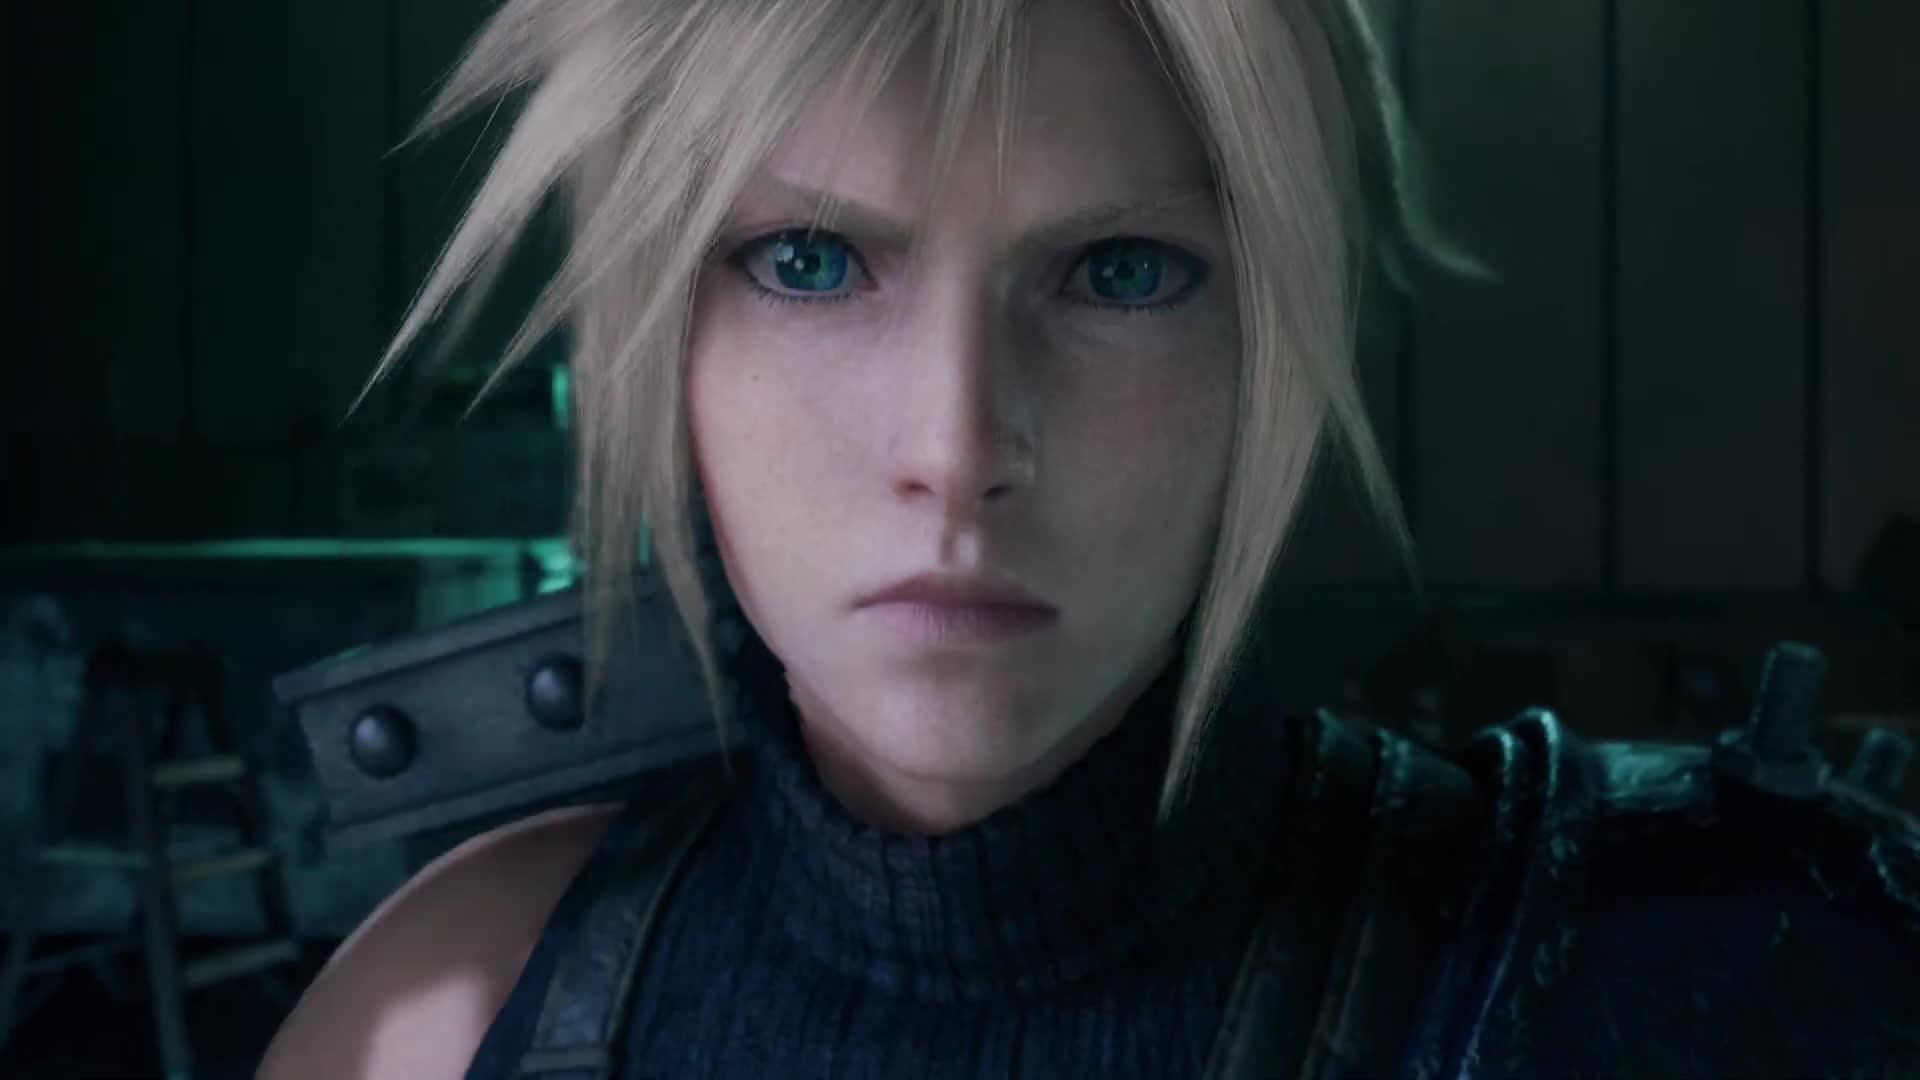 Trailer, Rollenspiel, Square Enix, Final Fantasy, Game Awards, final fantasy 7, Final Fantasy VII, Game Awards 2019, Final Fantasy 7 Remake